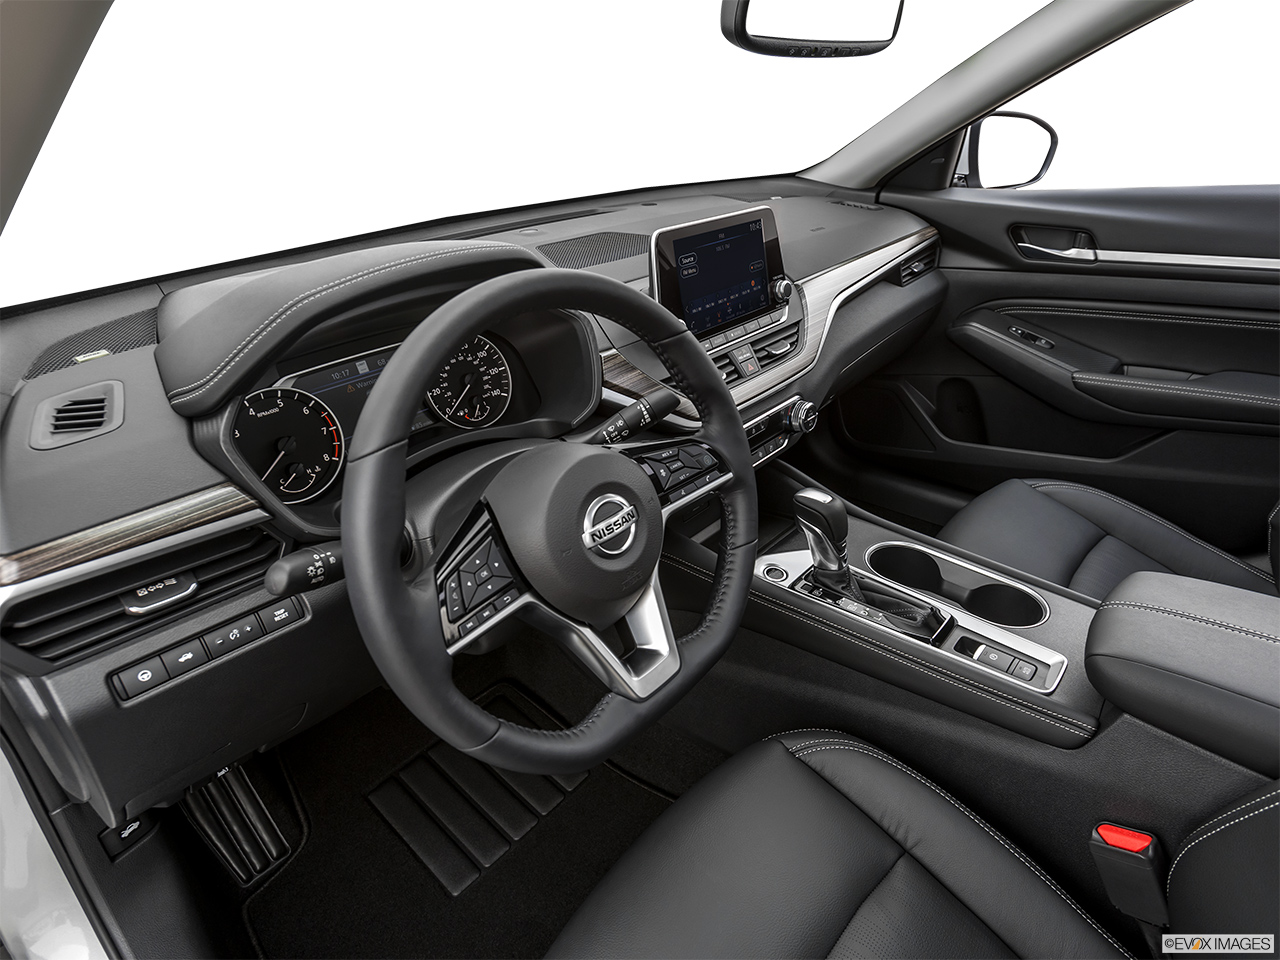 2019 Altima interior 1 - أسعار سيارات نيسان التيما 2021 في الأمارات